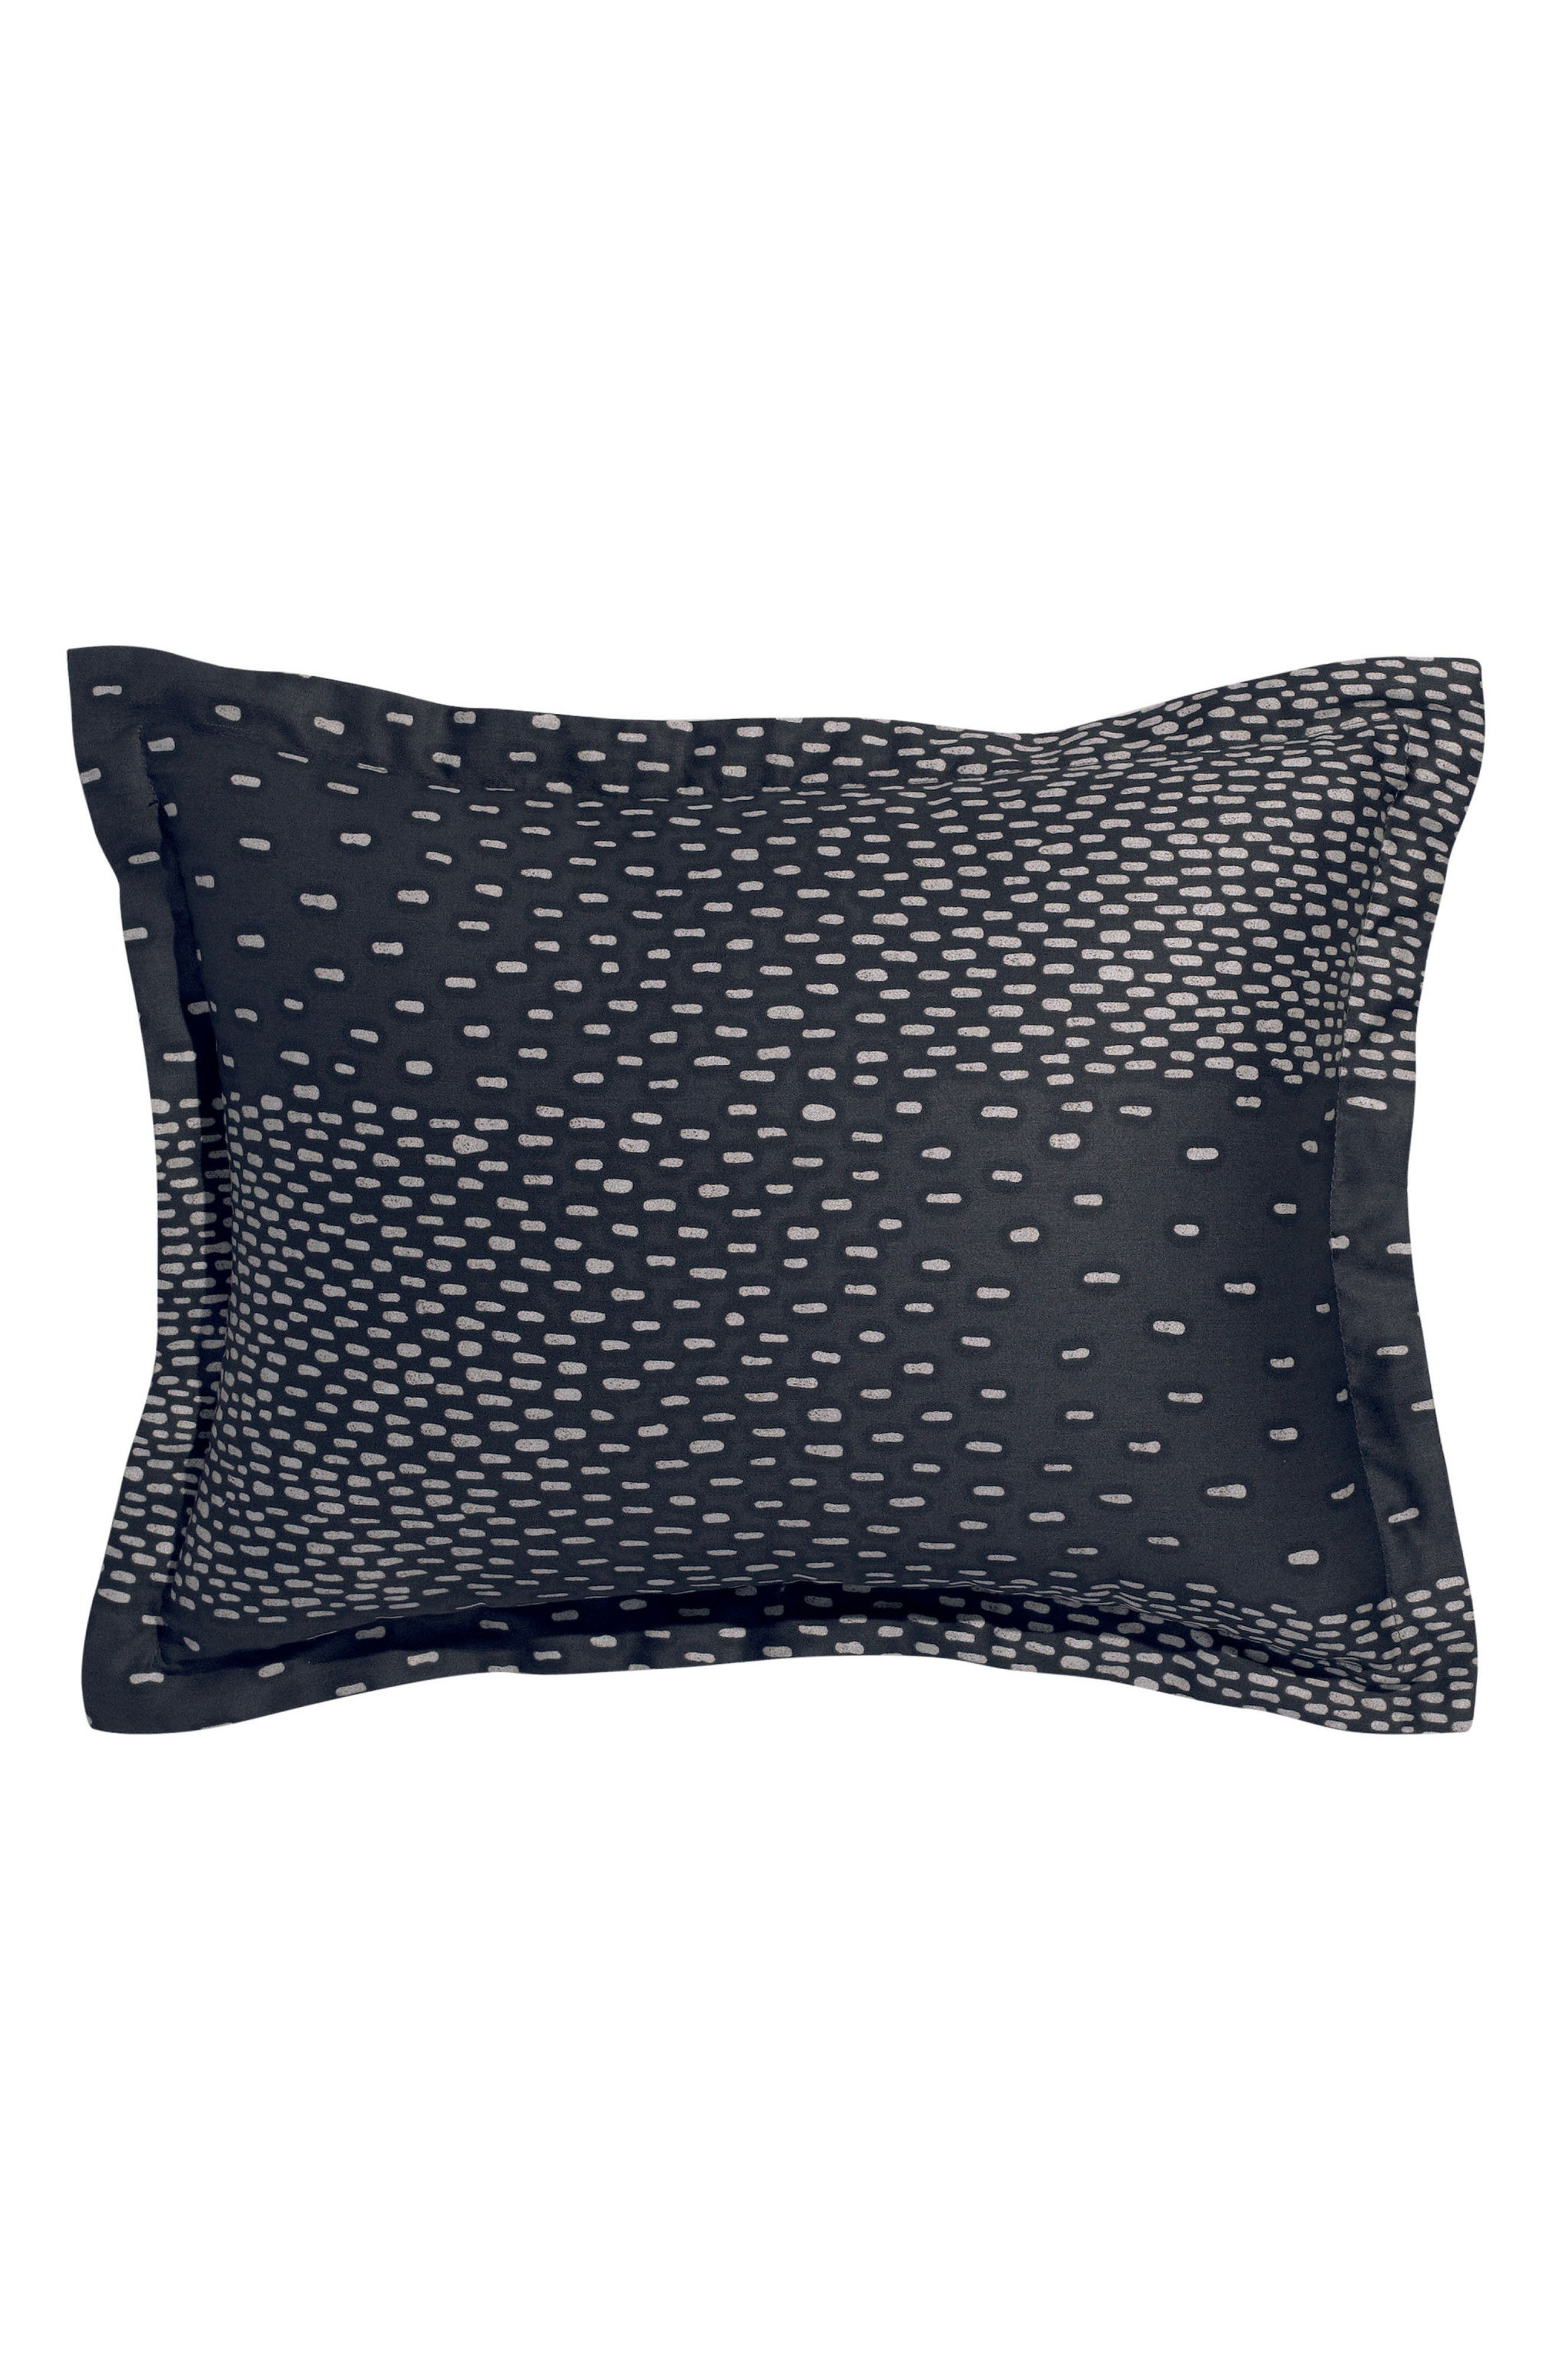 Nova Sky Accent Pillow,                             Main thumbnail 1, color,                             Black